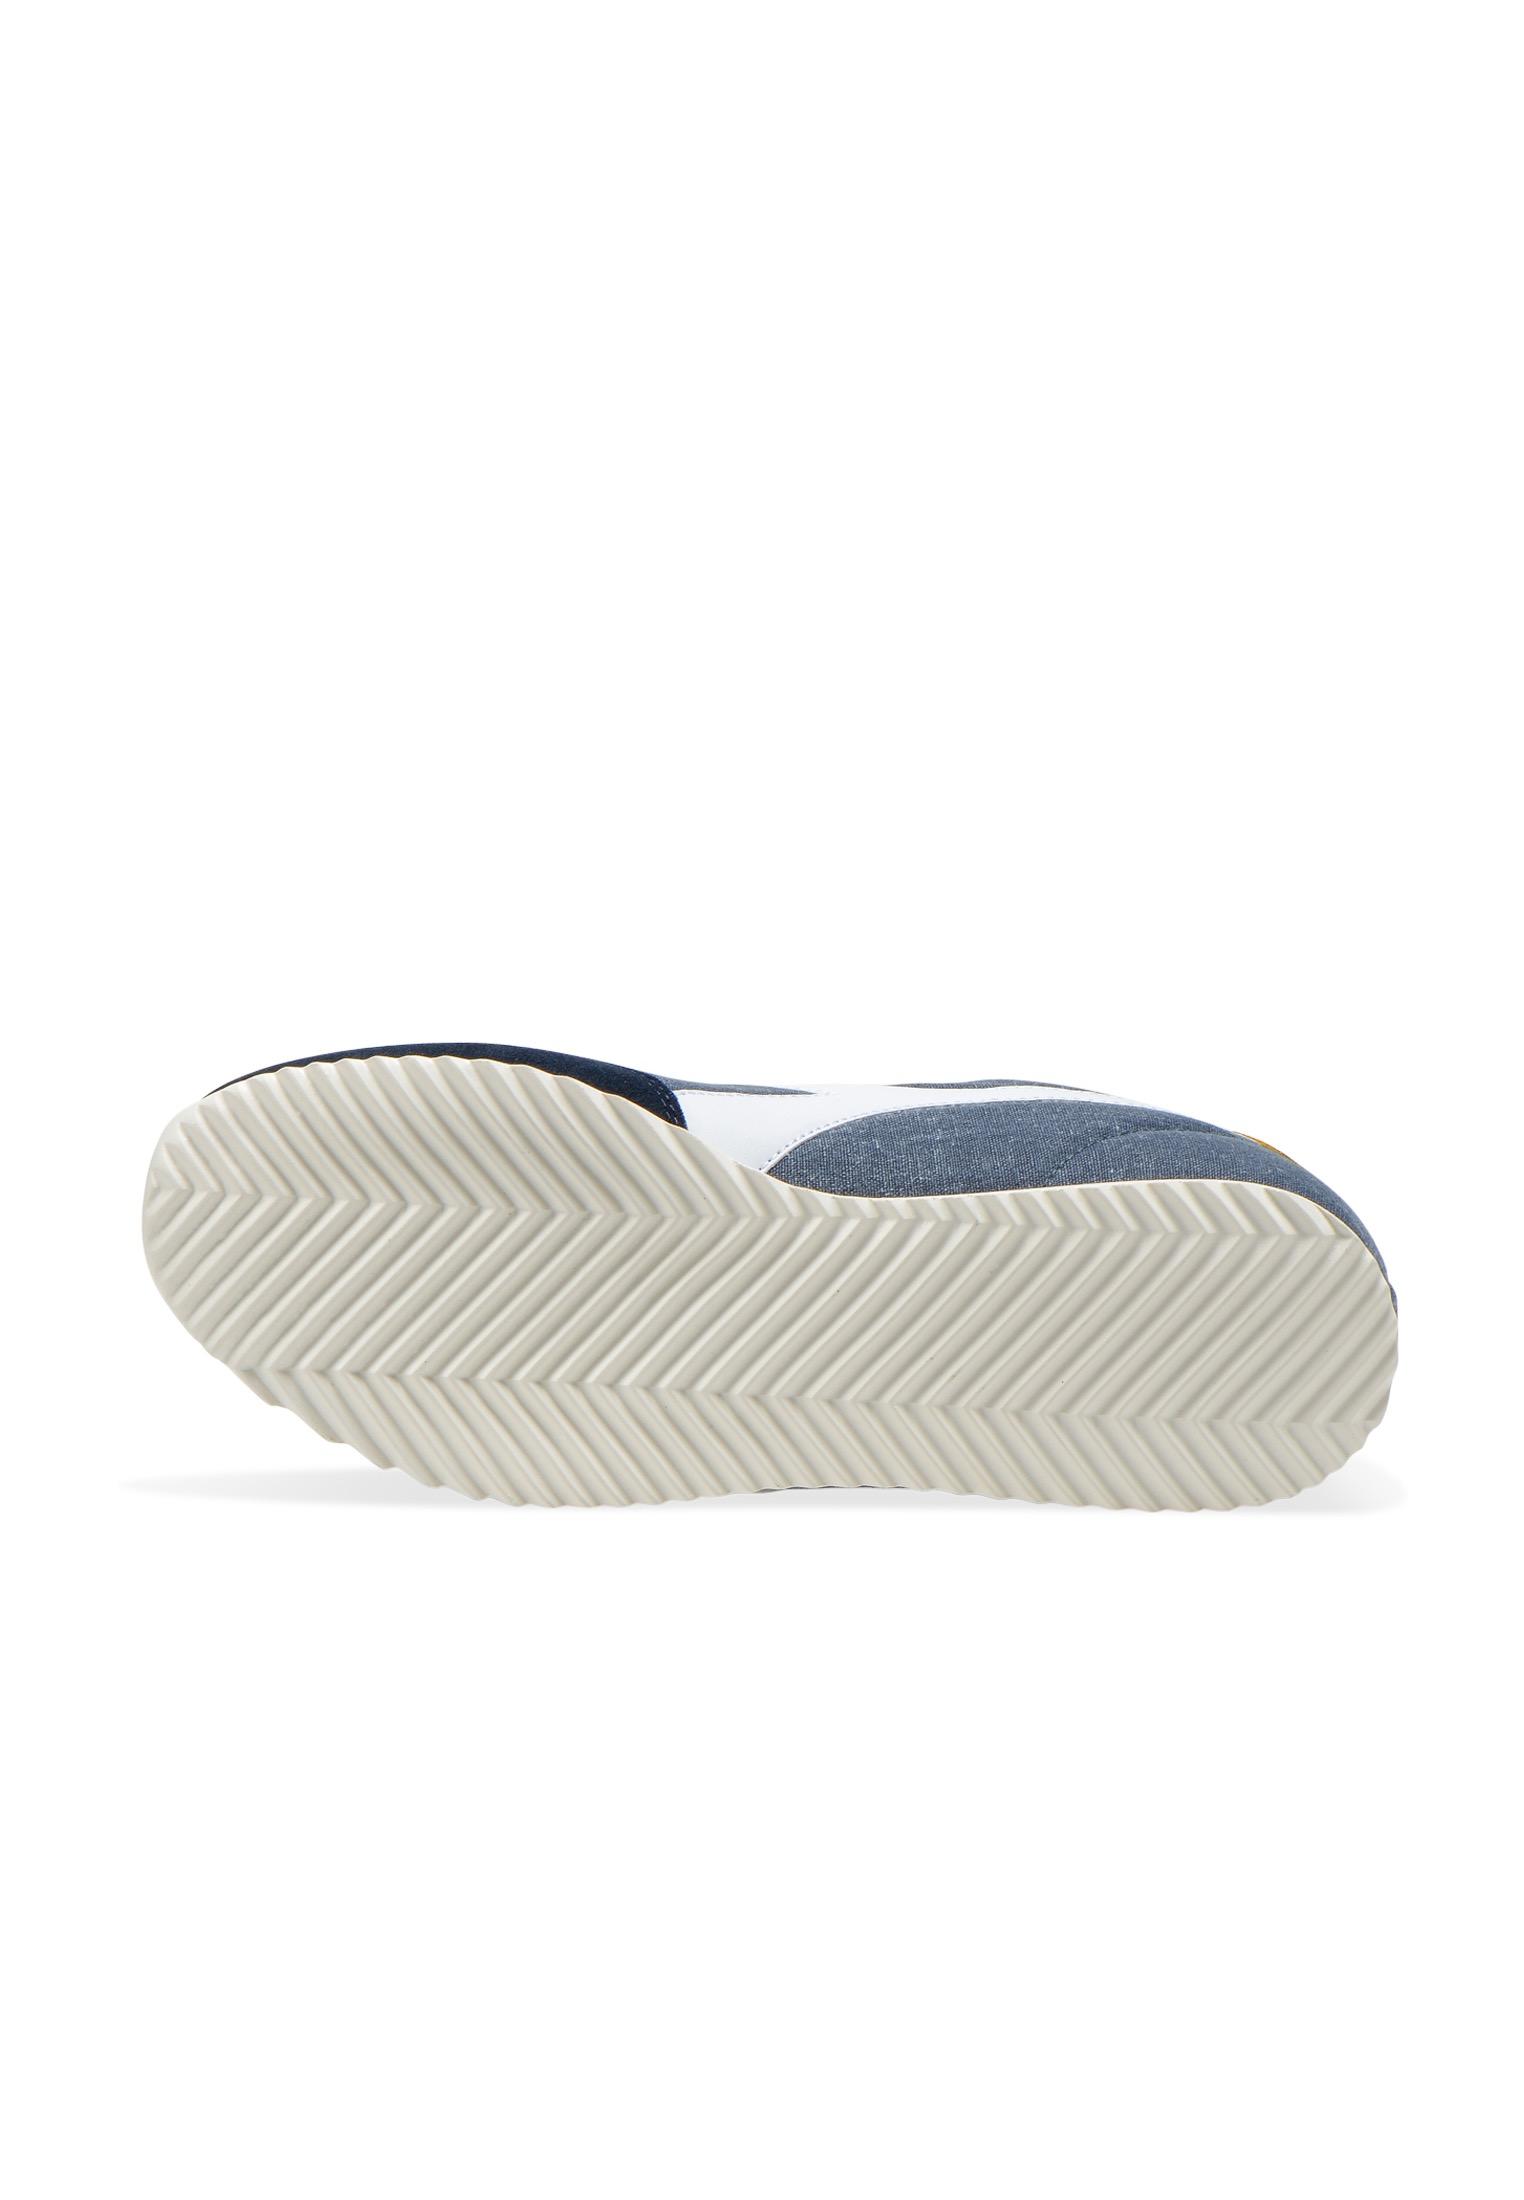 Scarpe-Diadora-Jog-Light-C-Sneakers-sportive-uomo-donna-vari-colori-e-taglie miniatura 58